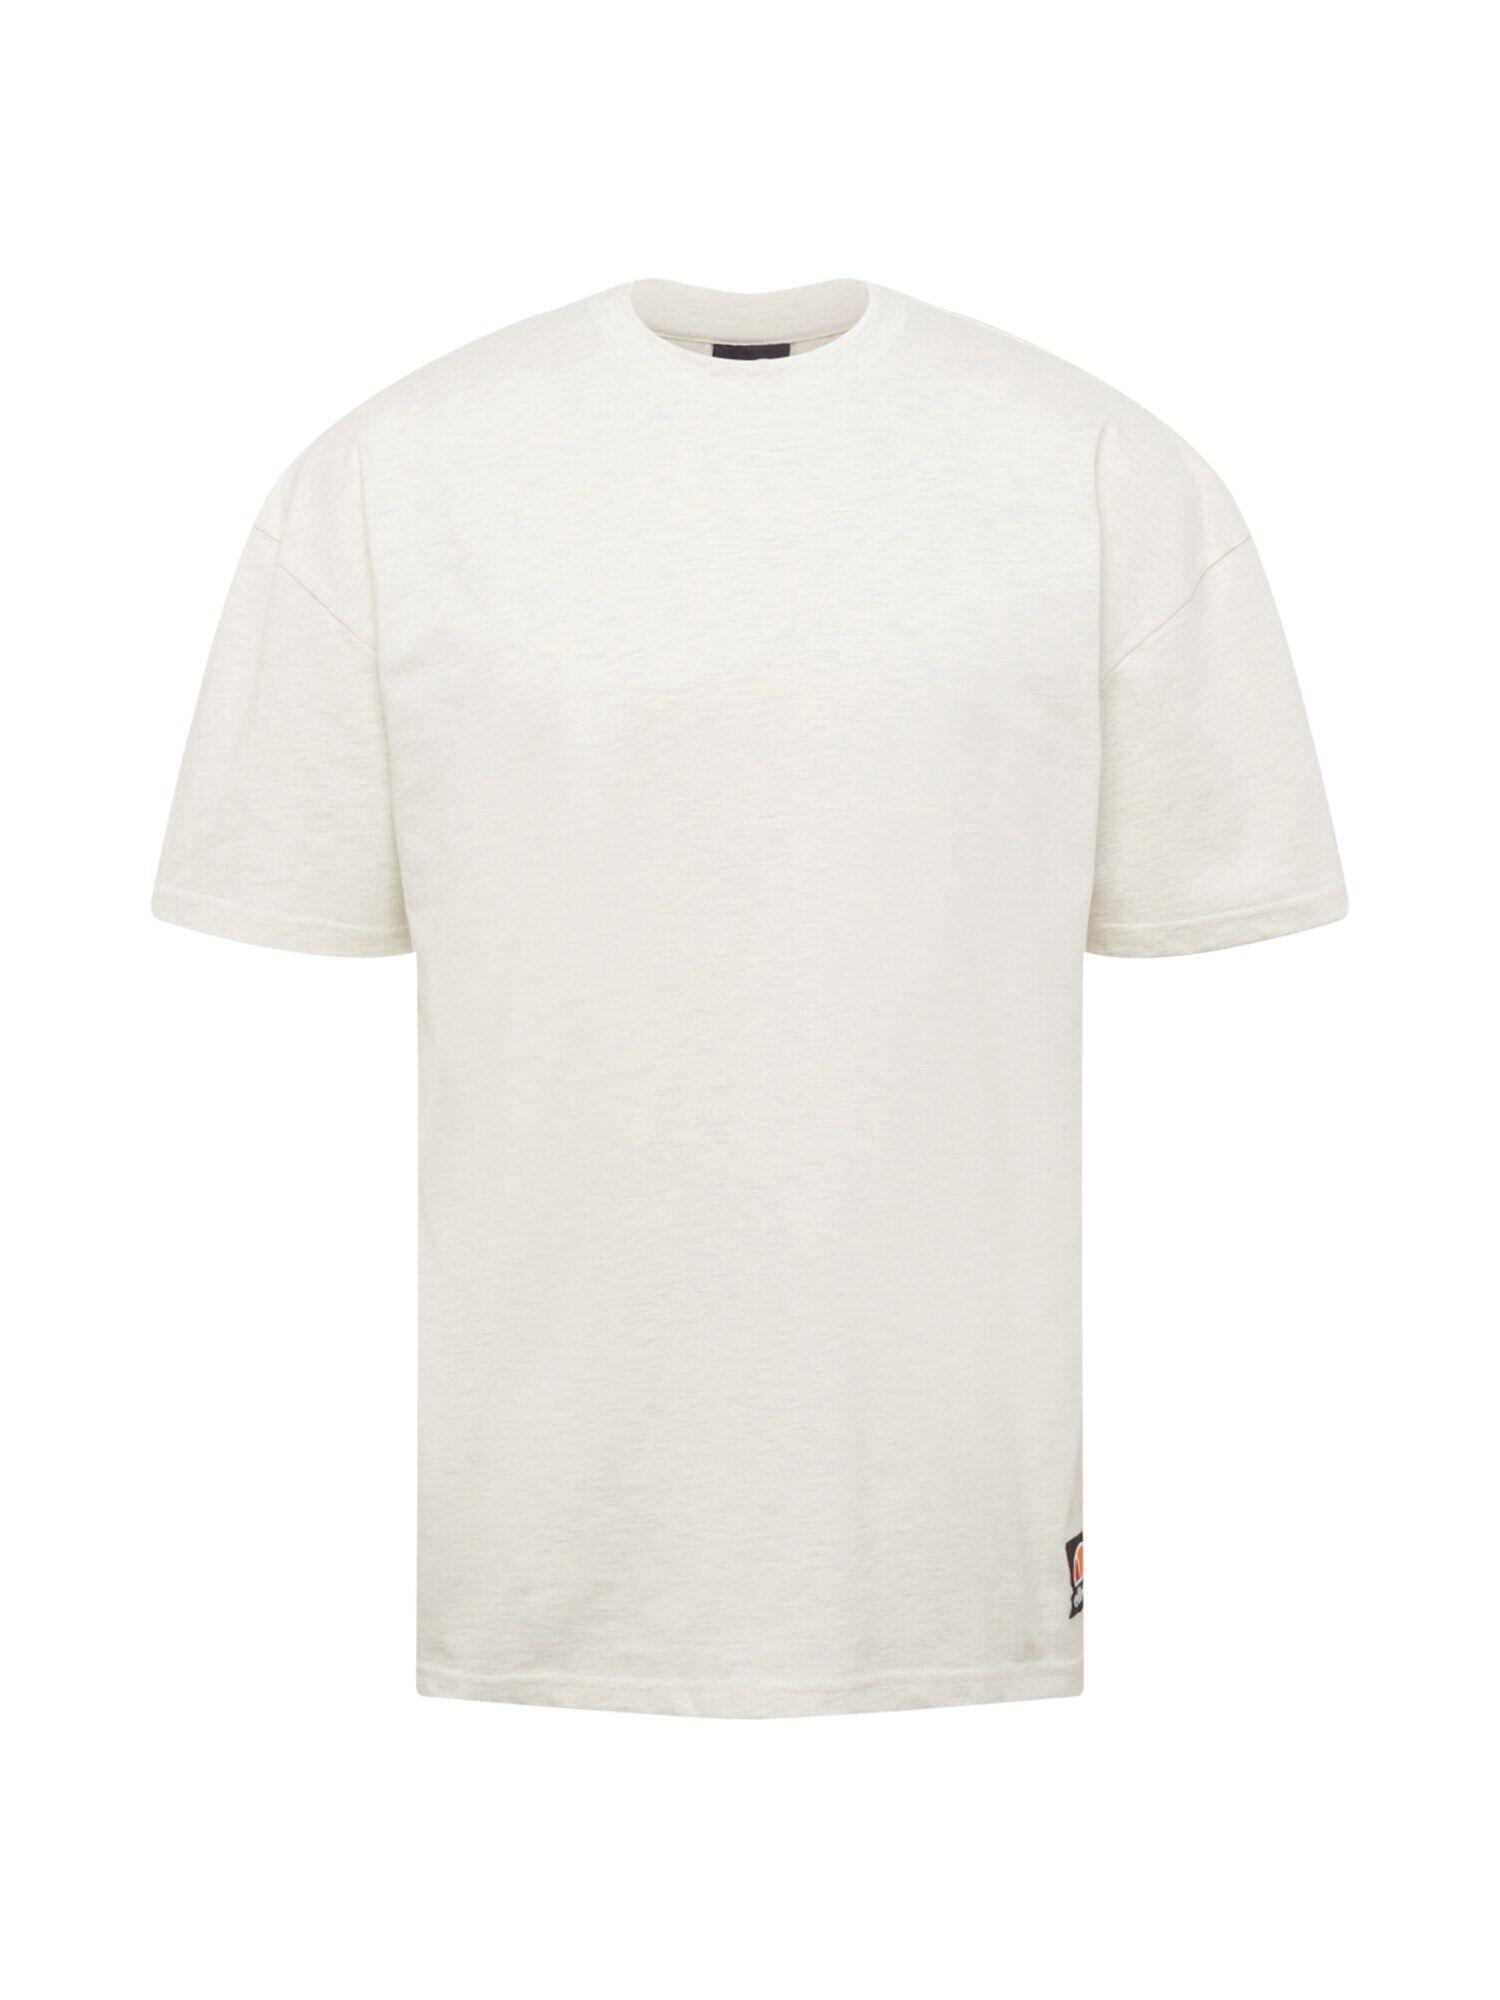 ELLESSE T-Shirt 'Avis'  - Blanc - Taille: M - male